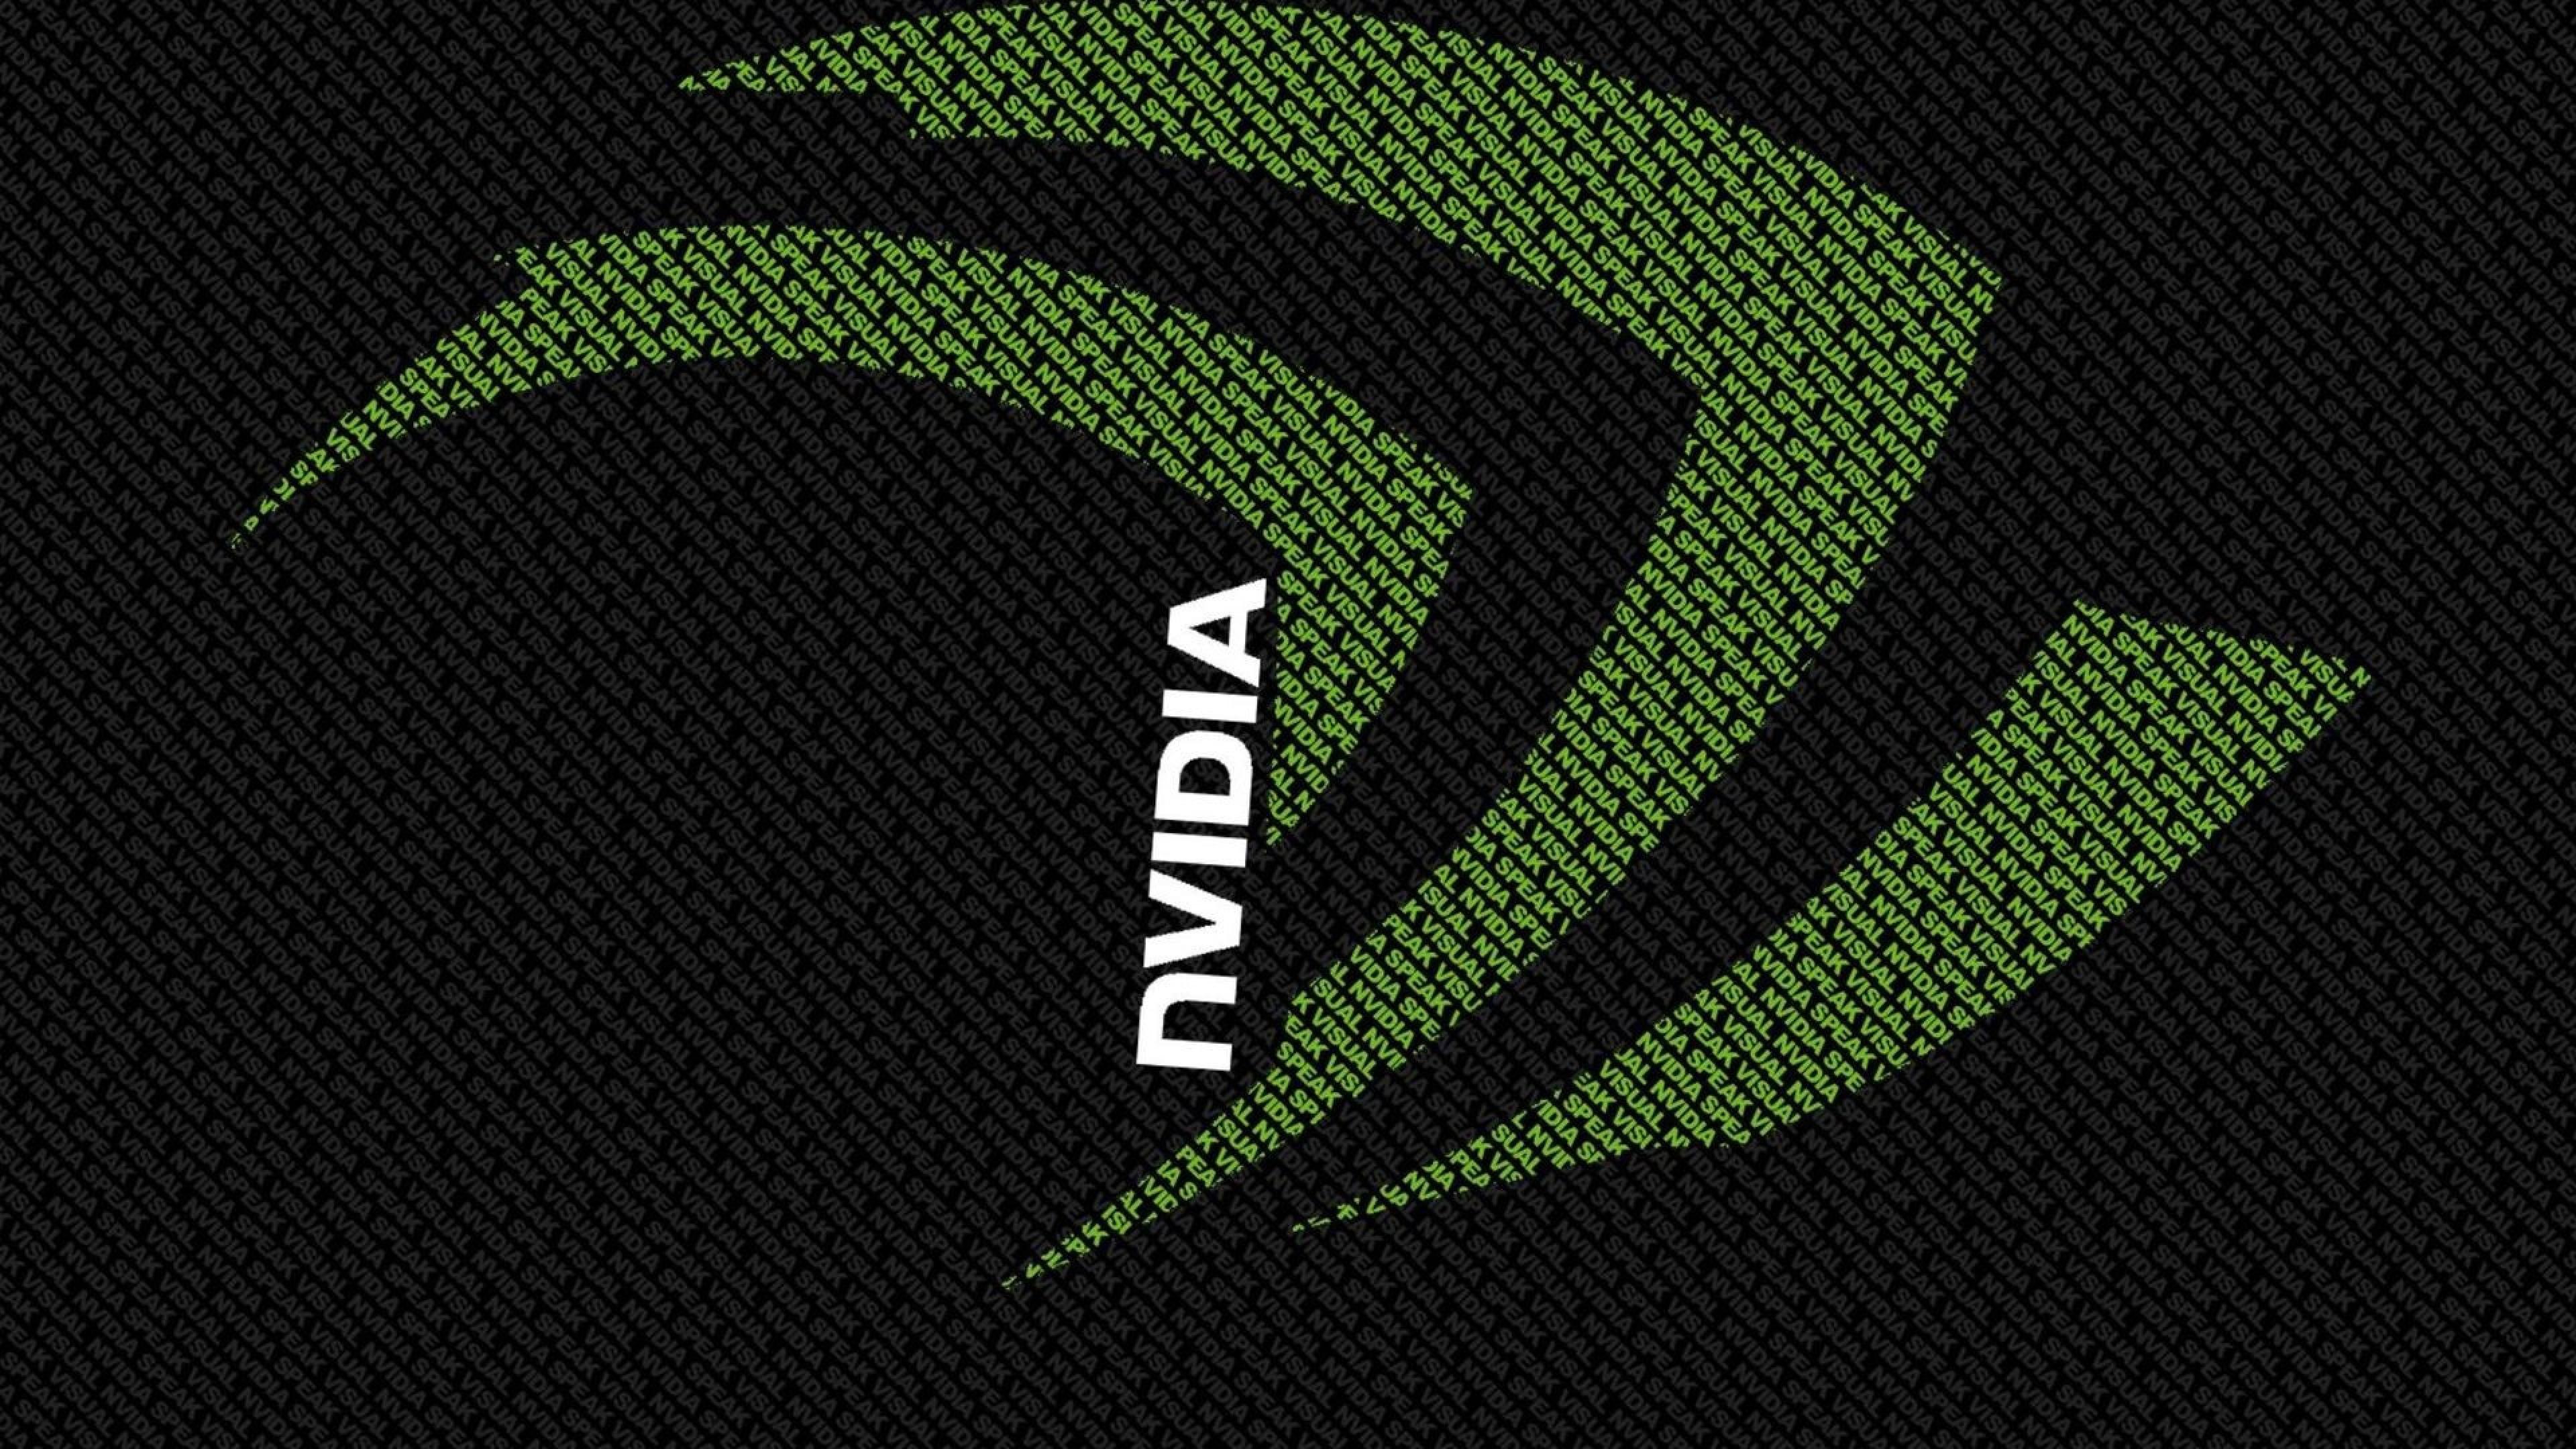 48 4k nvidia wallpaper on wallpapersafari - 1920x1080 wallpaper nvidia ...